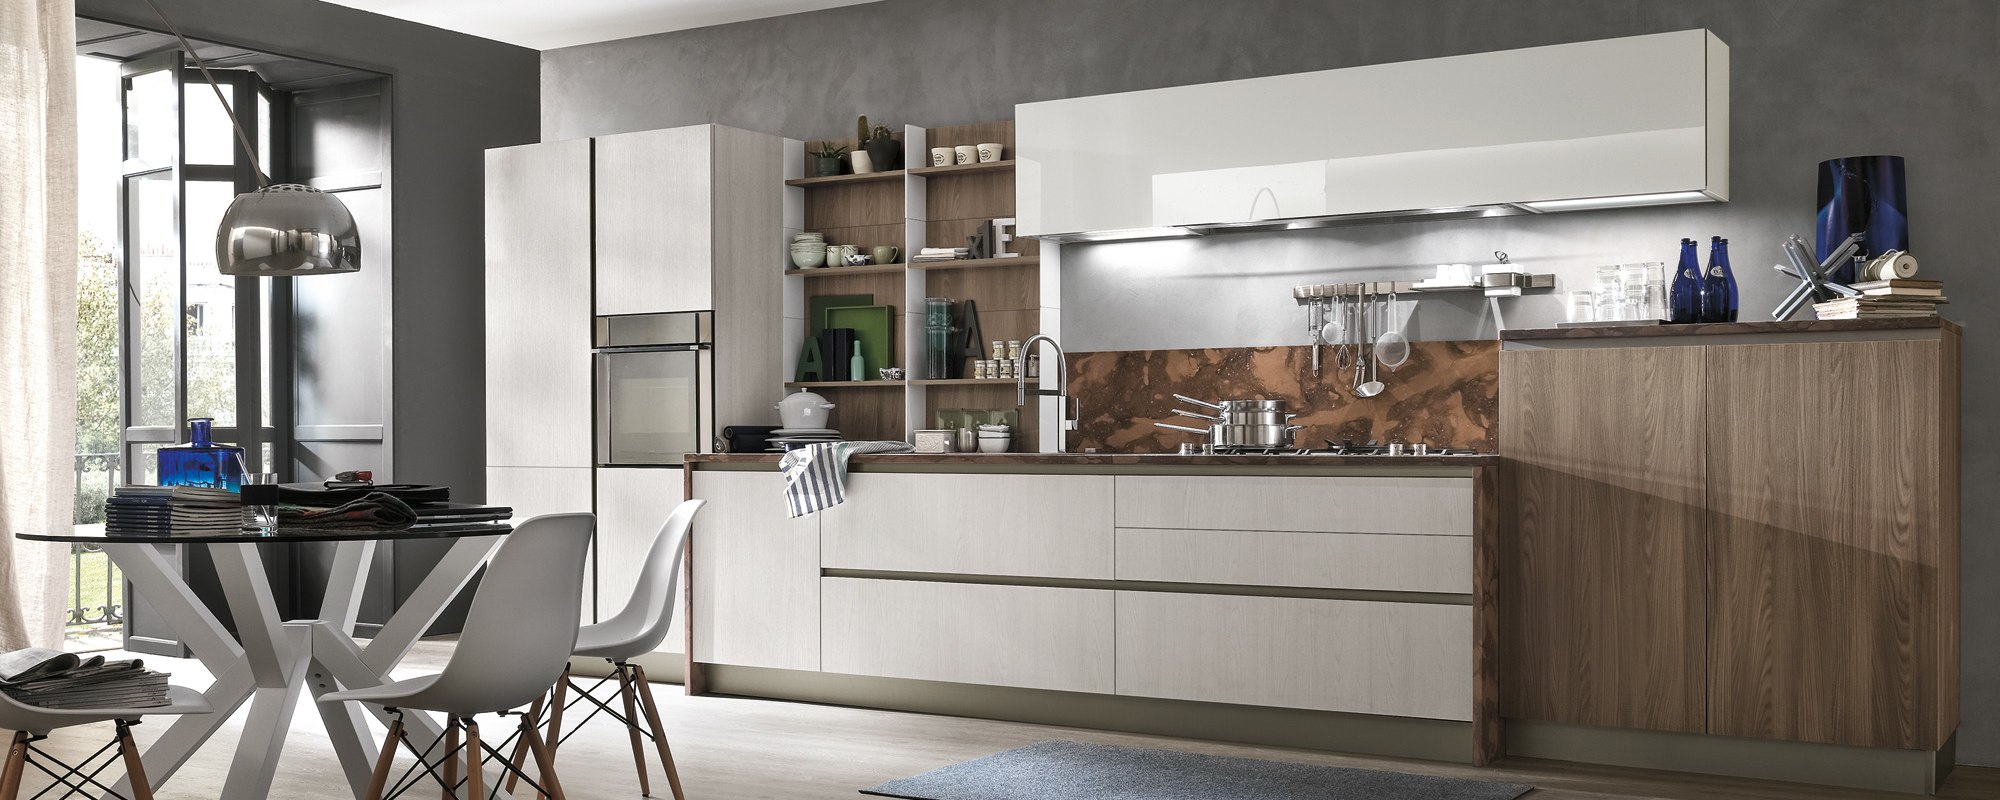 Infinity cucine stosa - Design cucine moderne ...